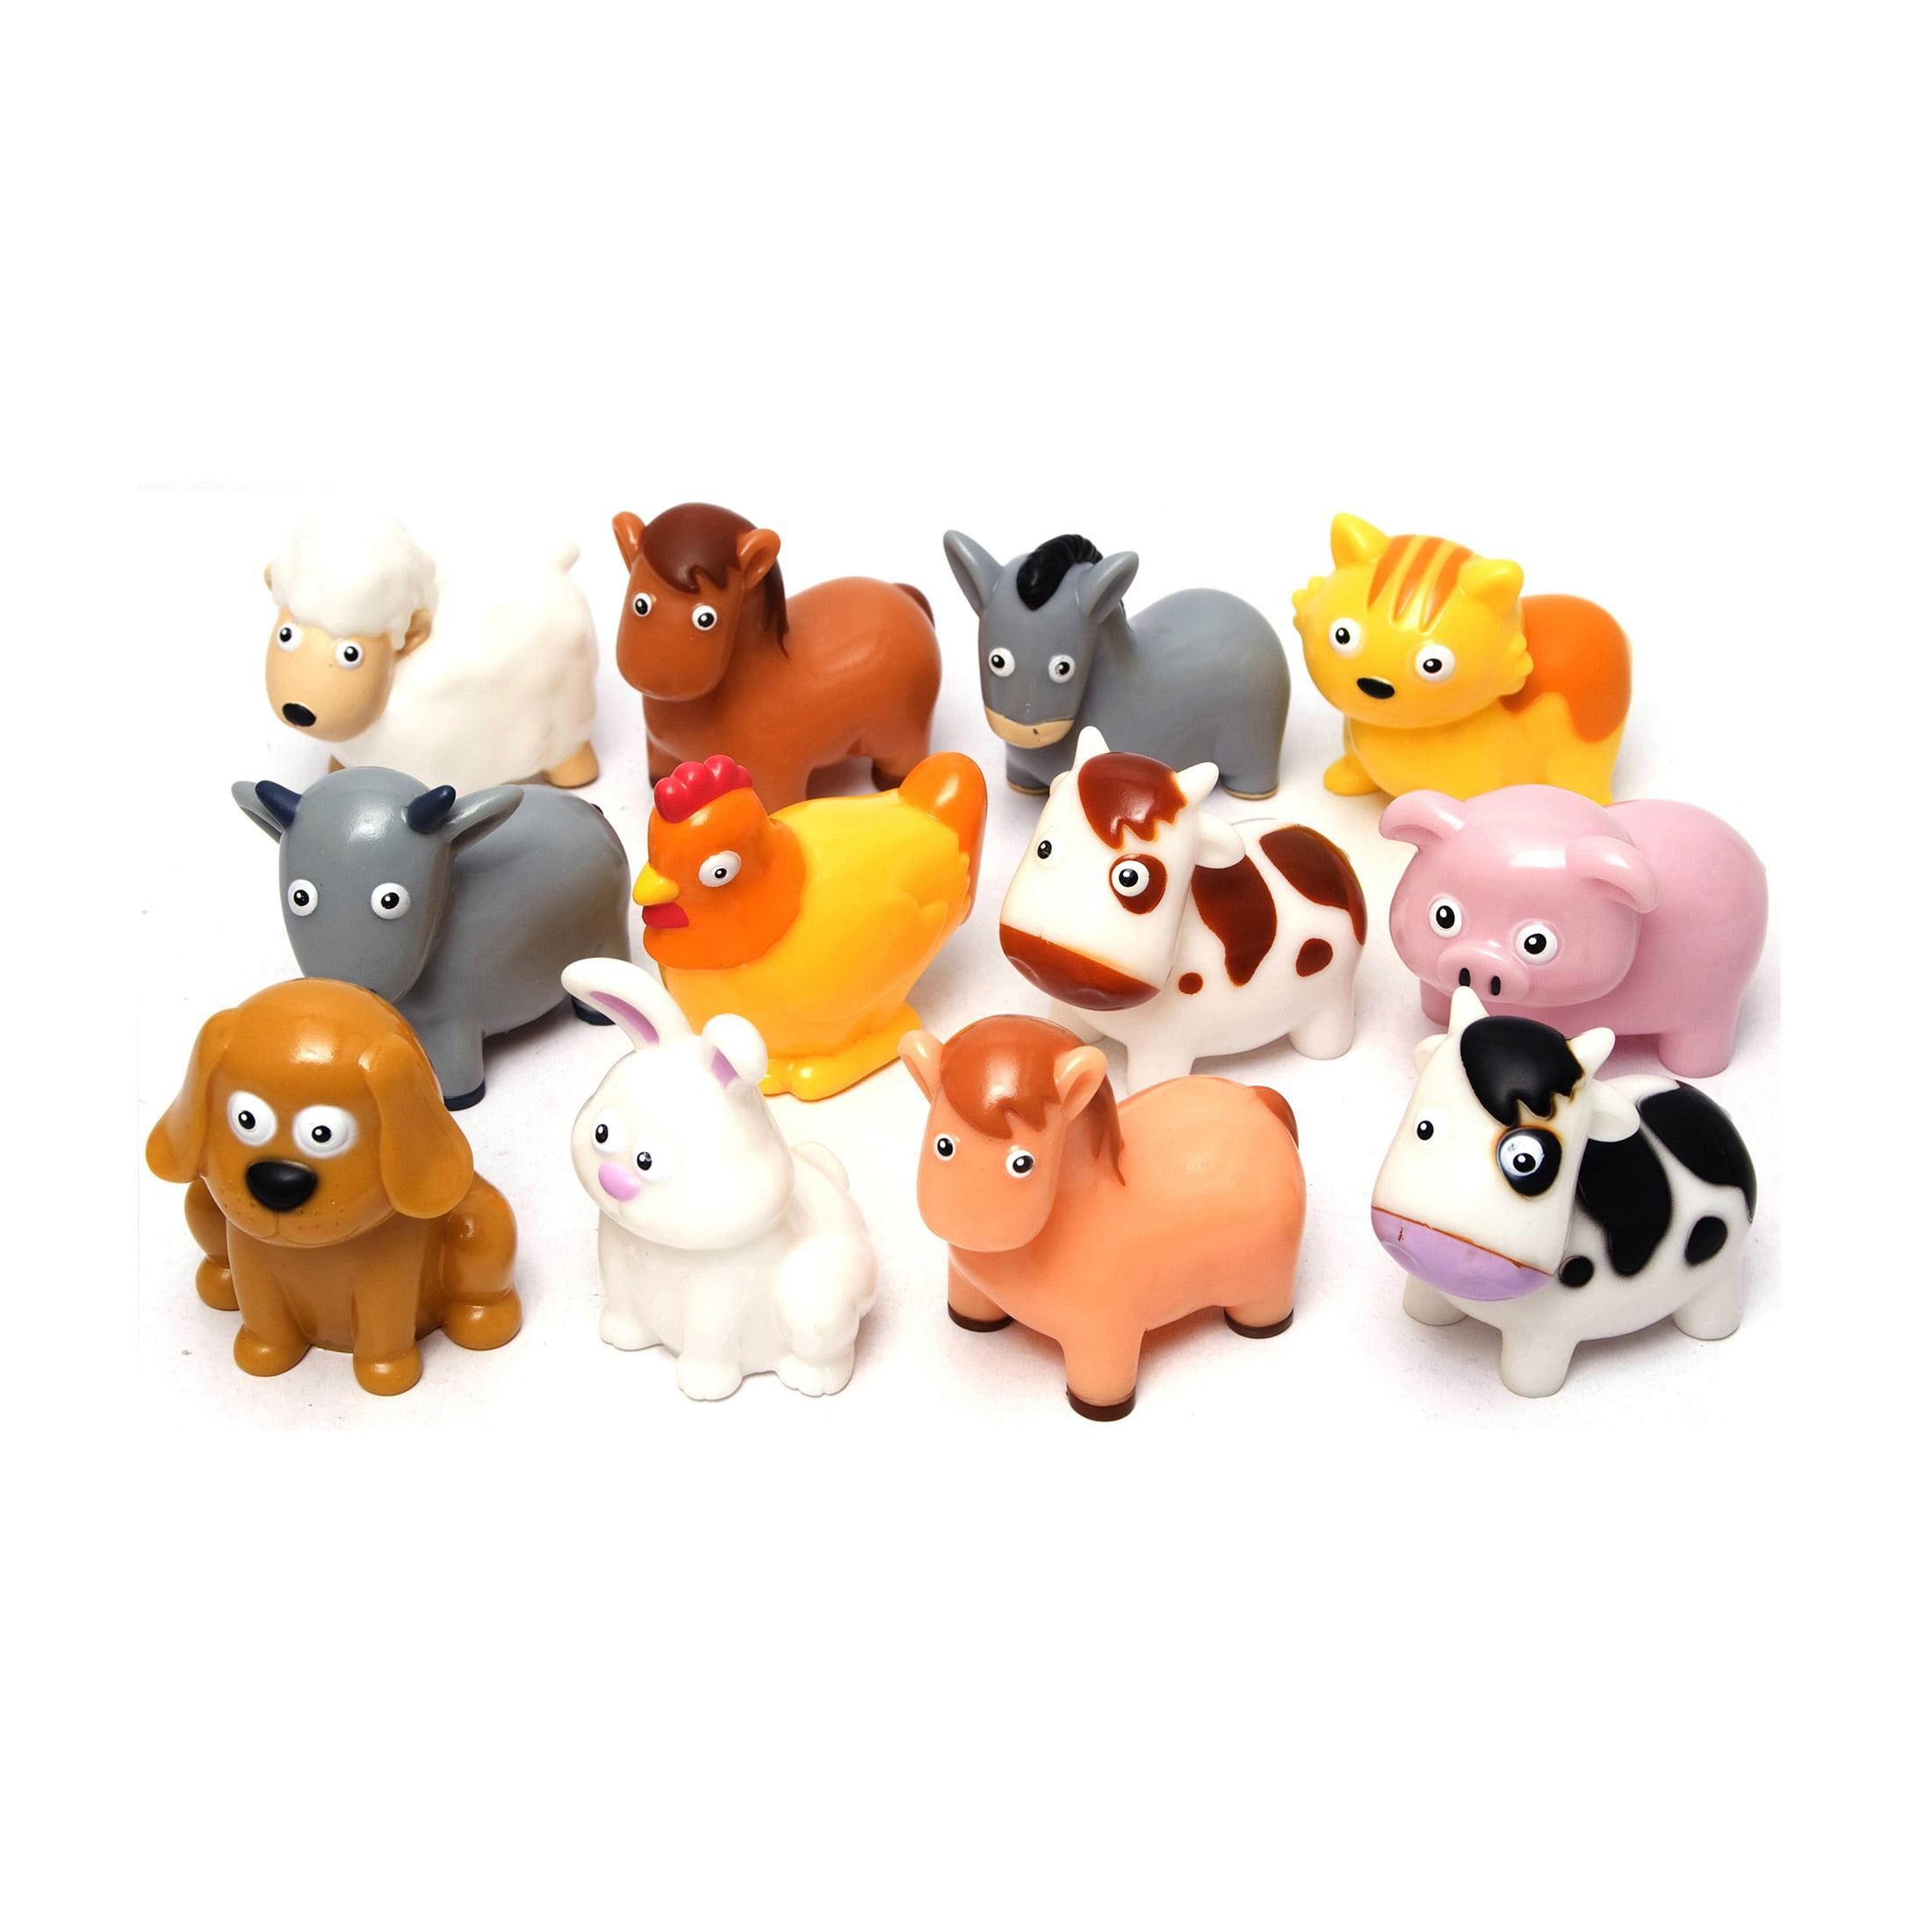 BOLEY 12 Piece Bucket of Farm Animal Figures by Boley